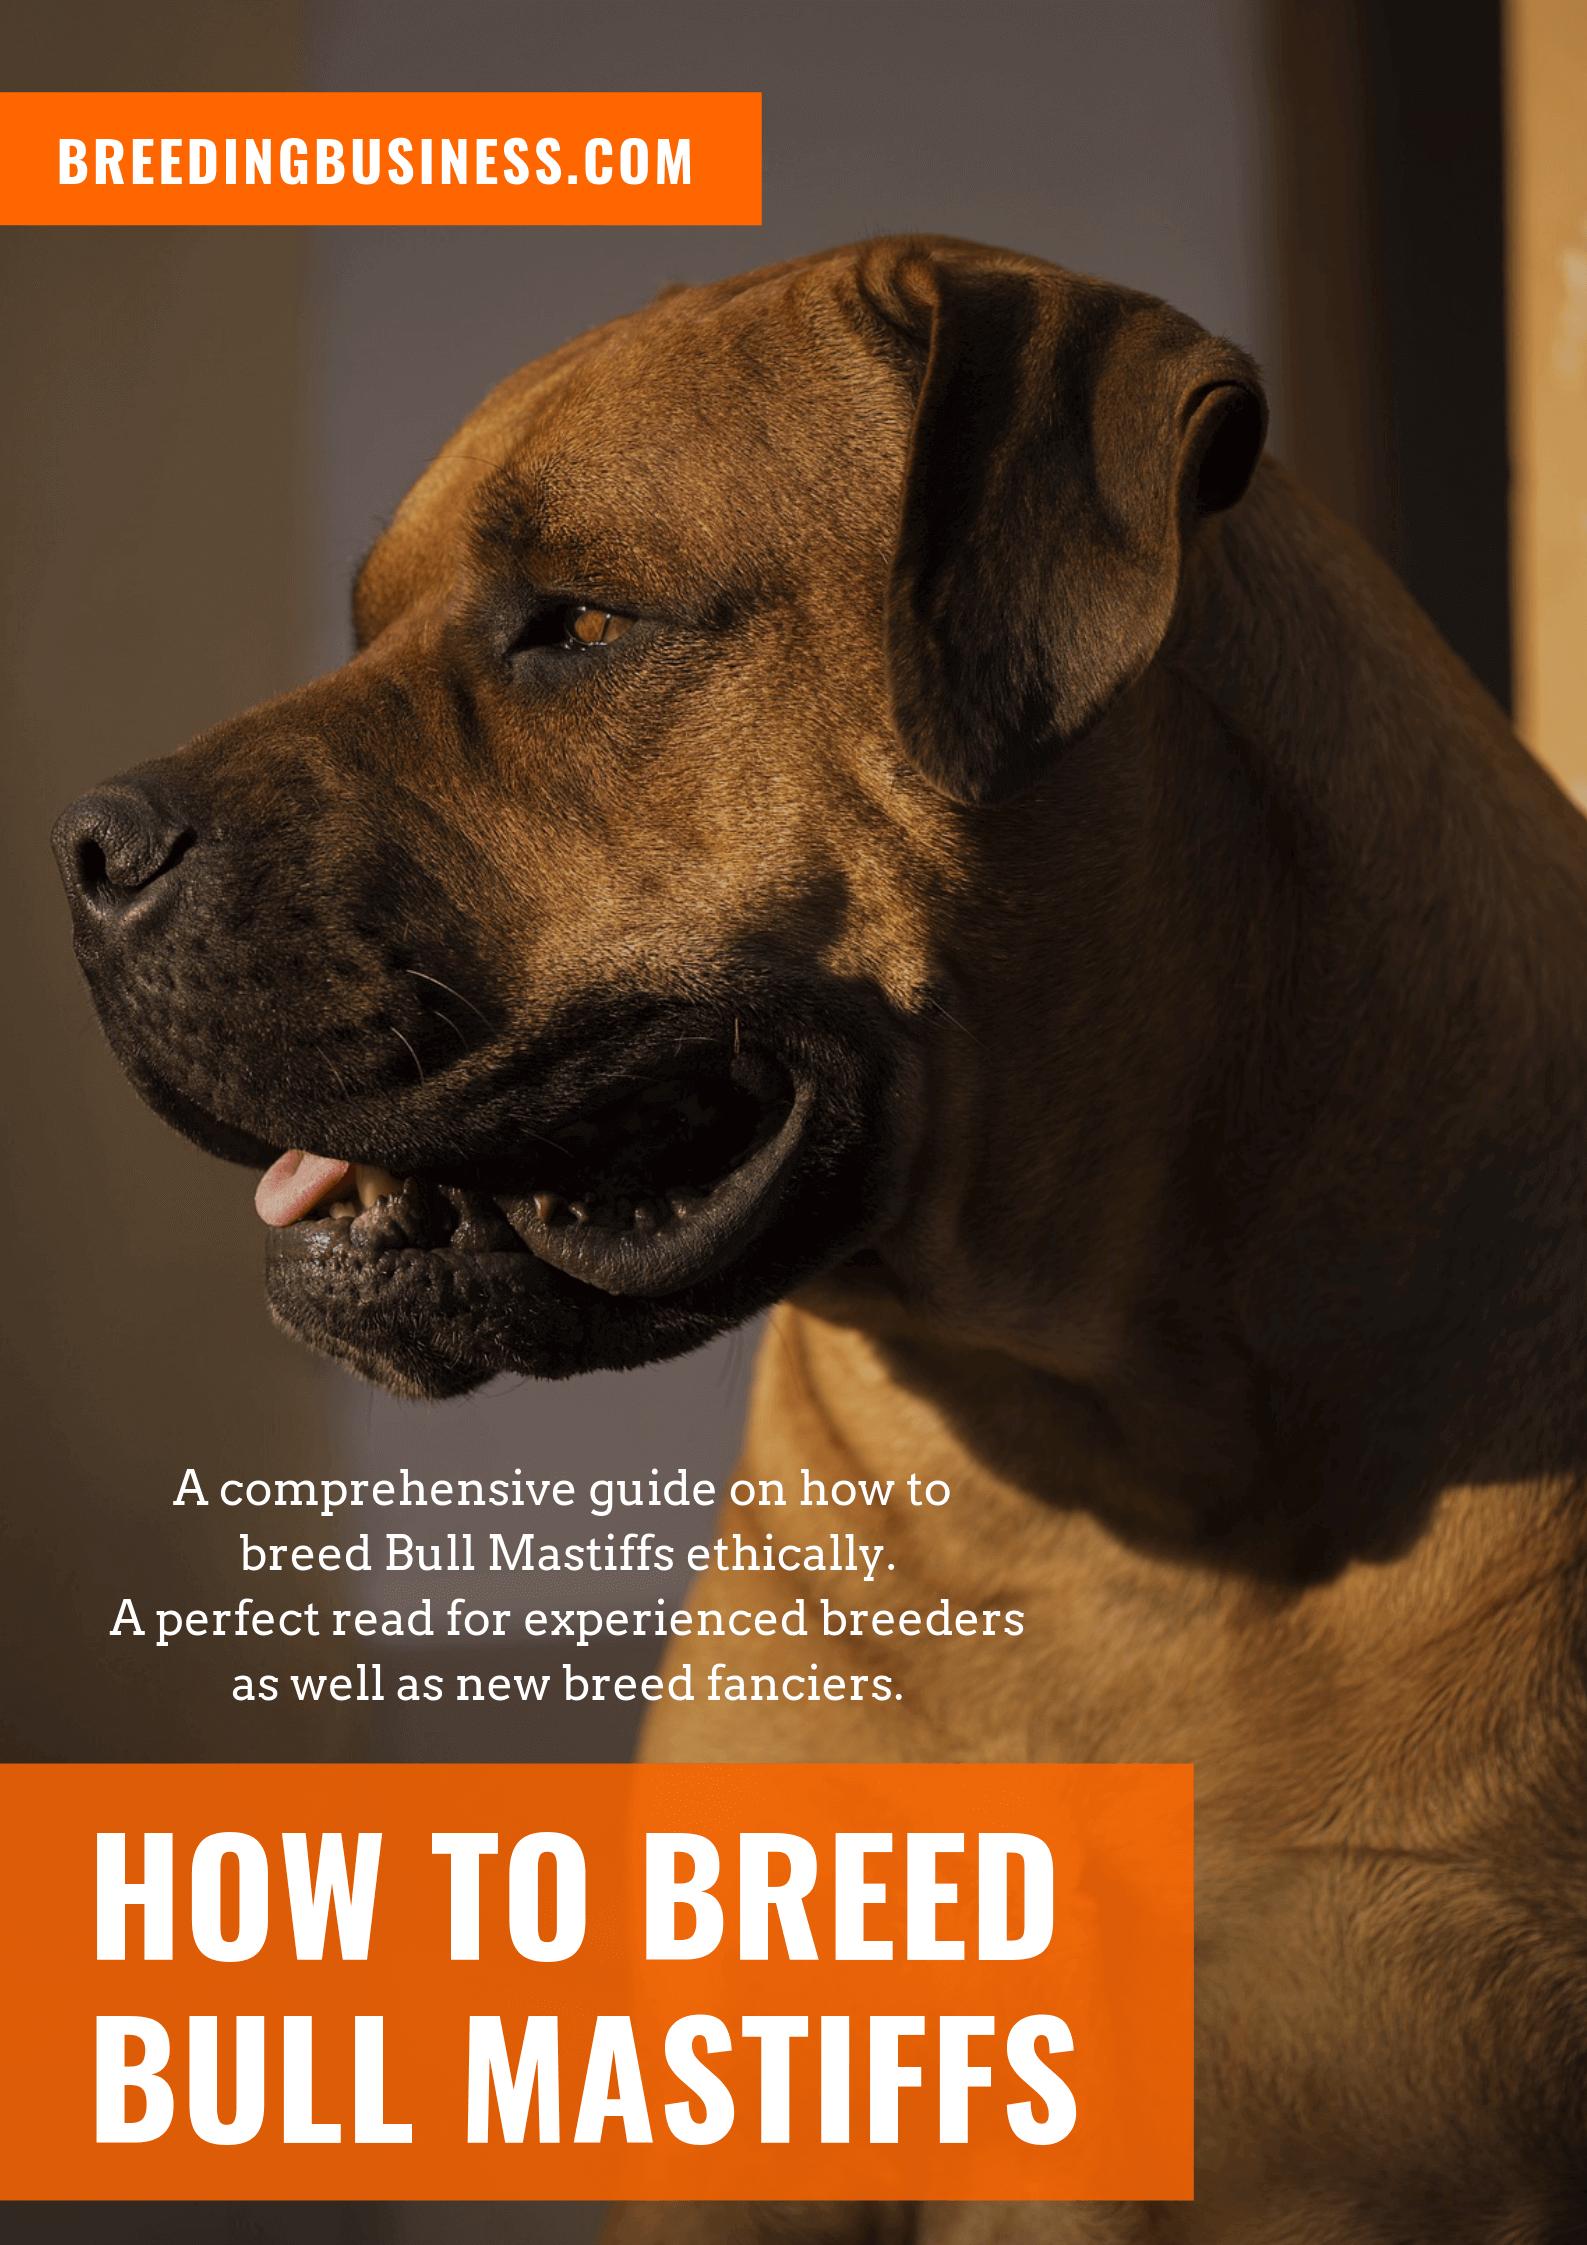 breeding Bull Mastiffs